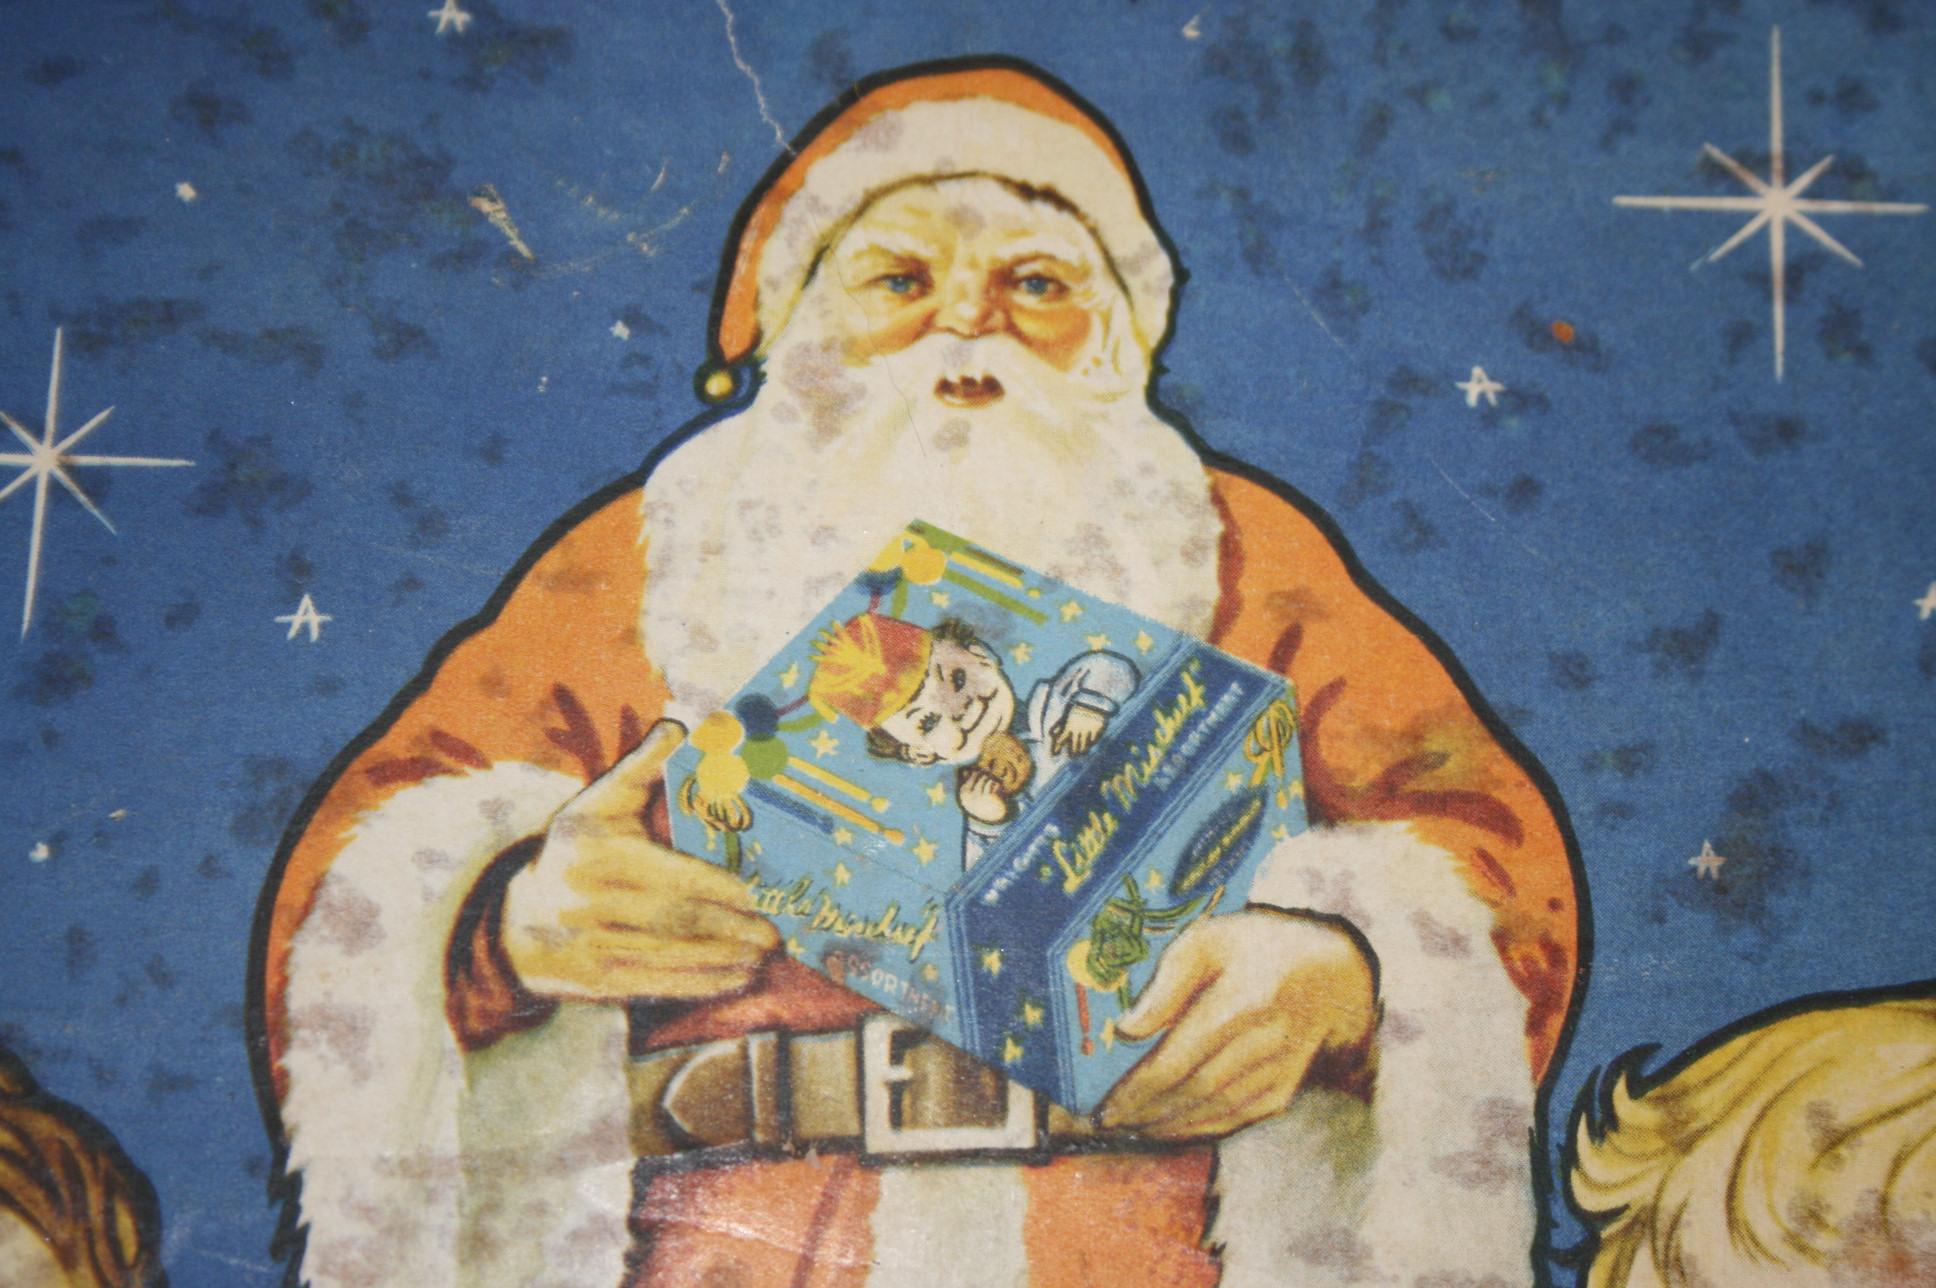 Wright's Christmas Assortment tin